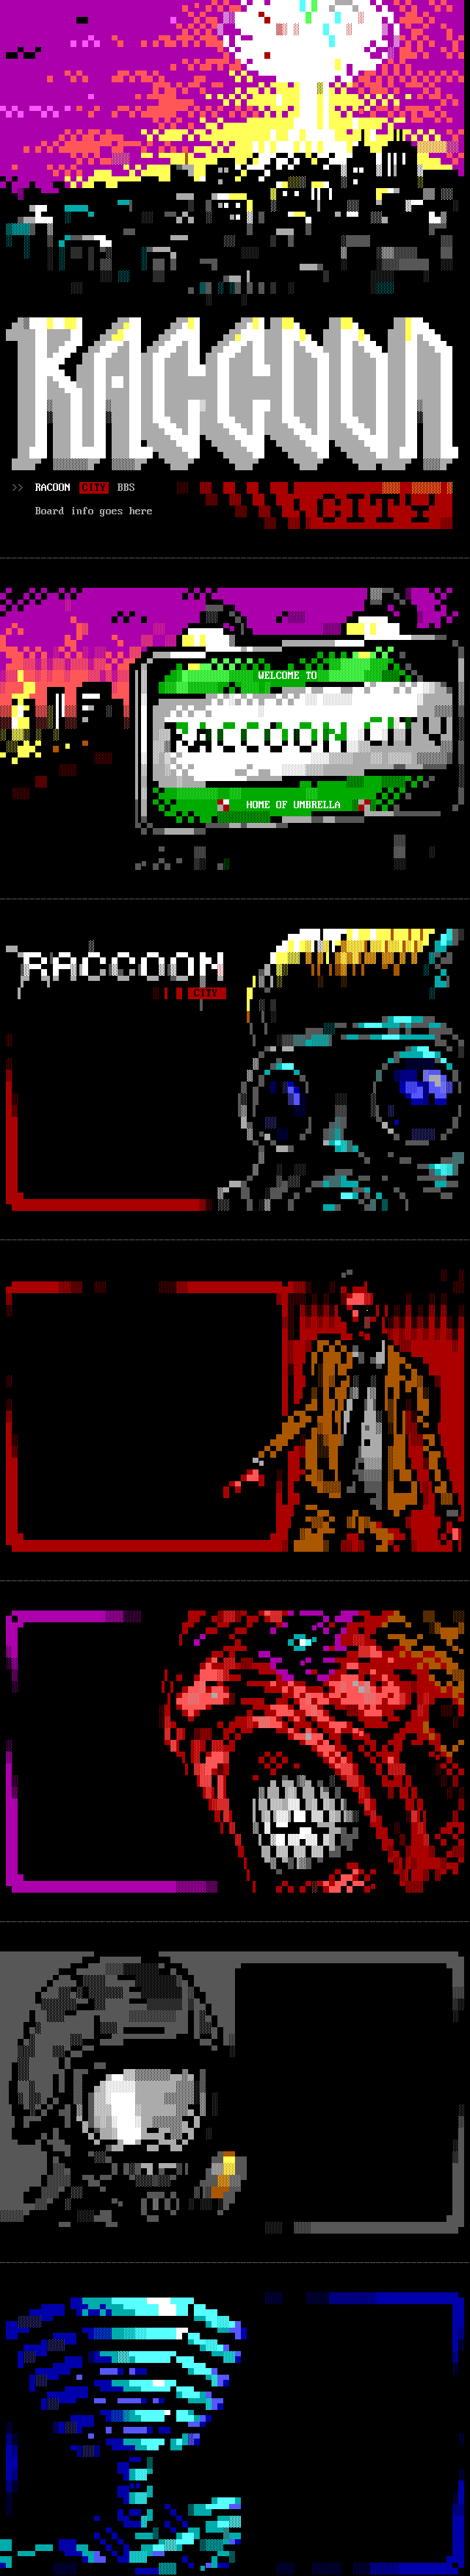 Raccoon City BBS Theme